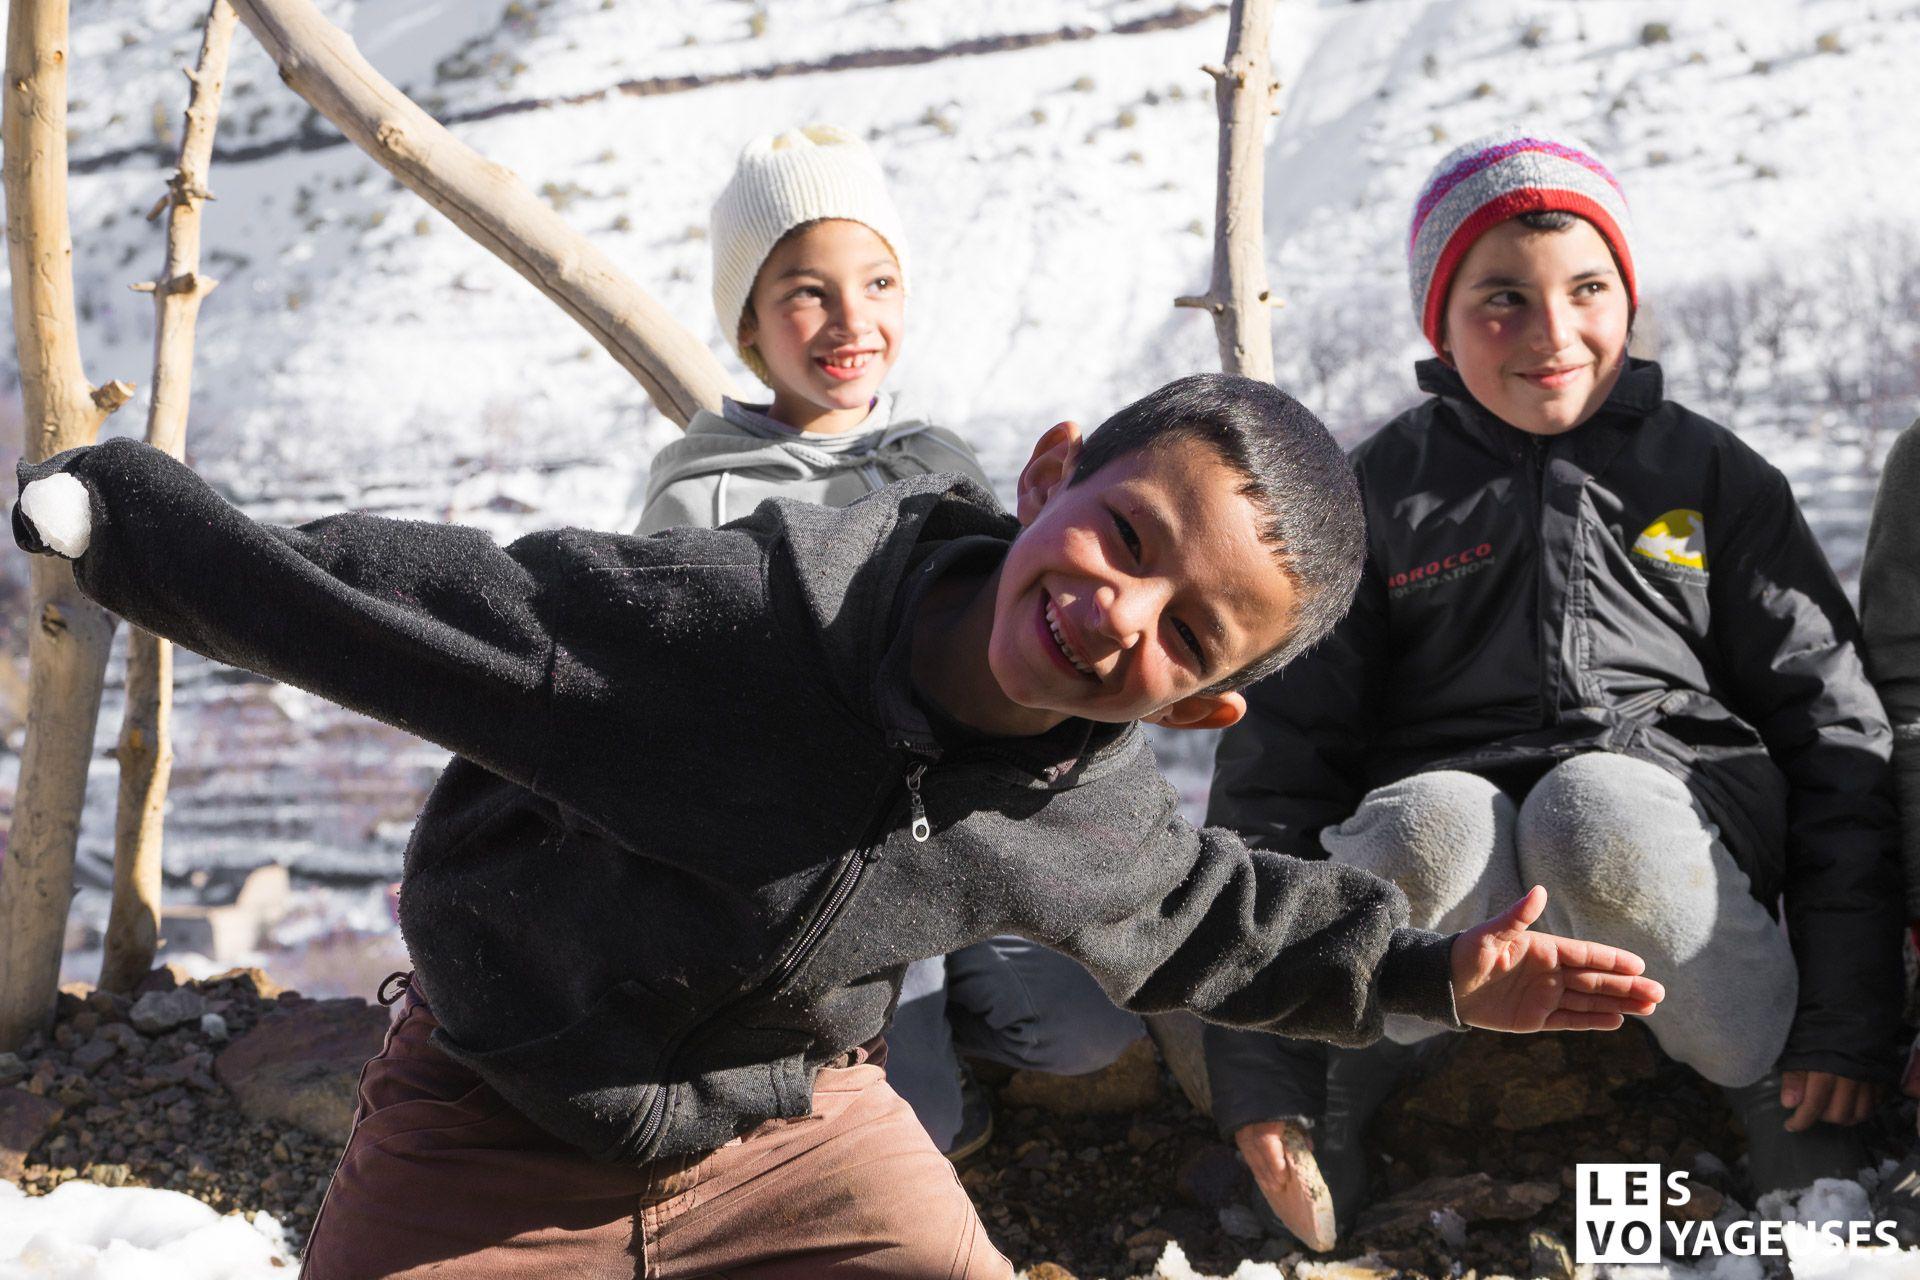 Les-voyageuses-maroc-imlil-hiver-00048